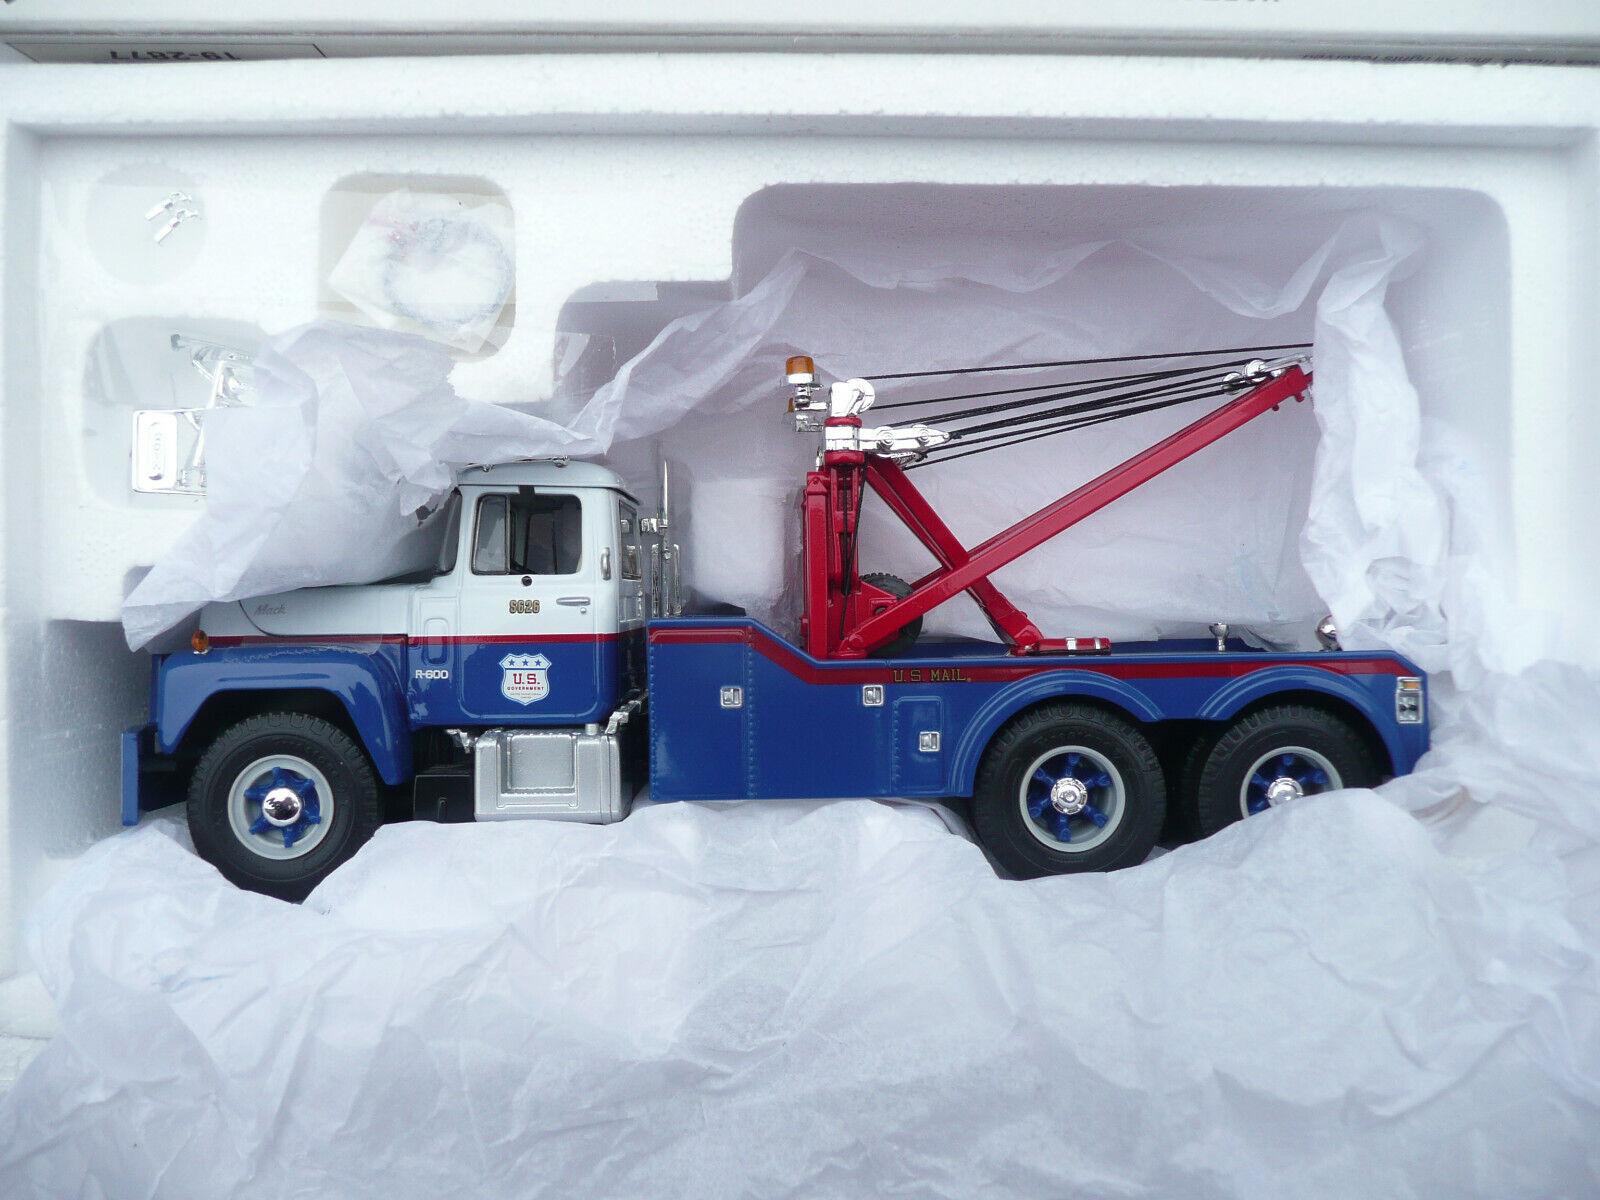 1st First Gear Mack R-Modell Tow Truck Die-cast Metal Replica 1 34